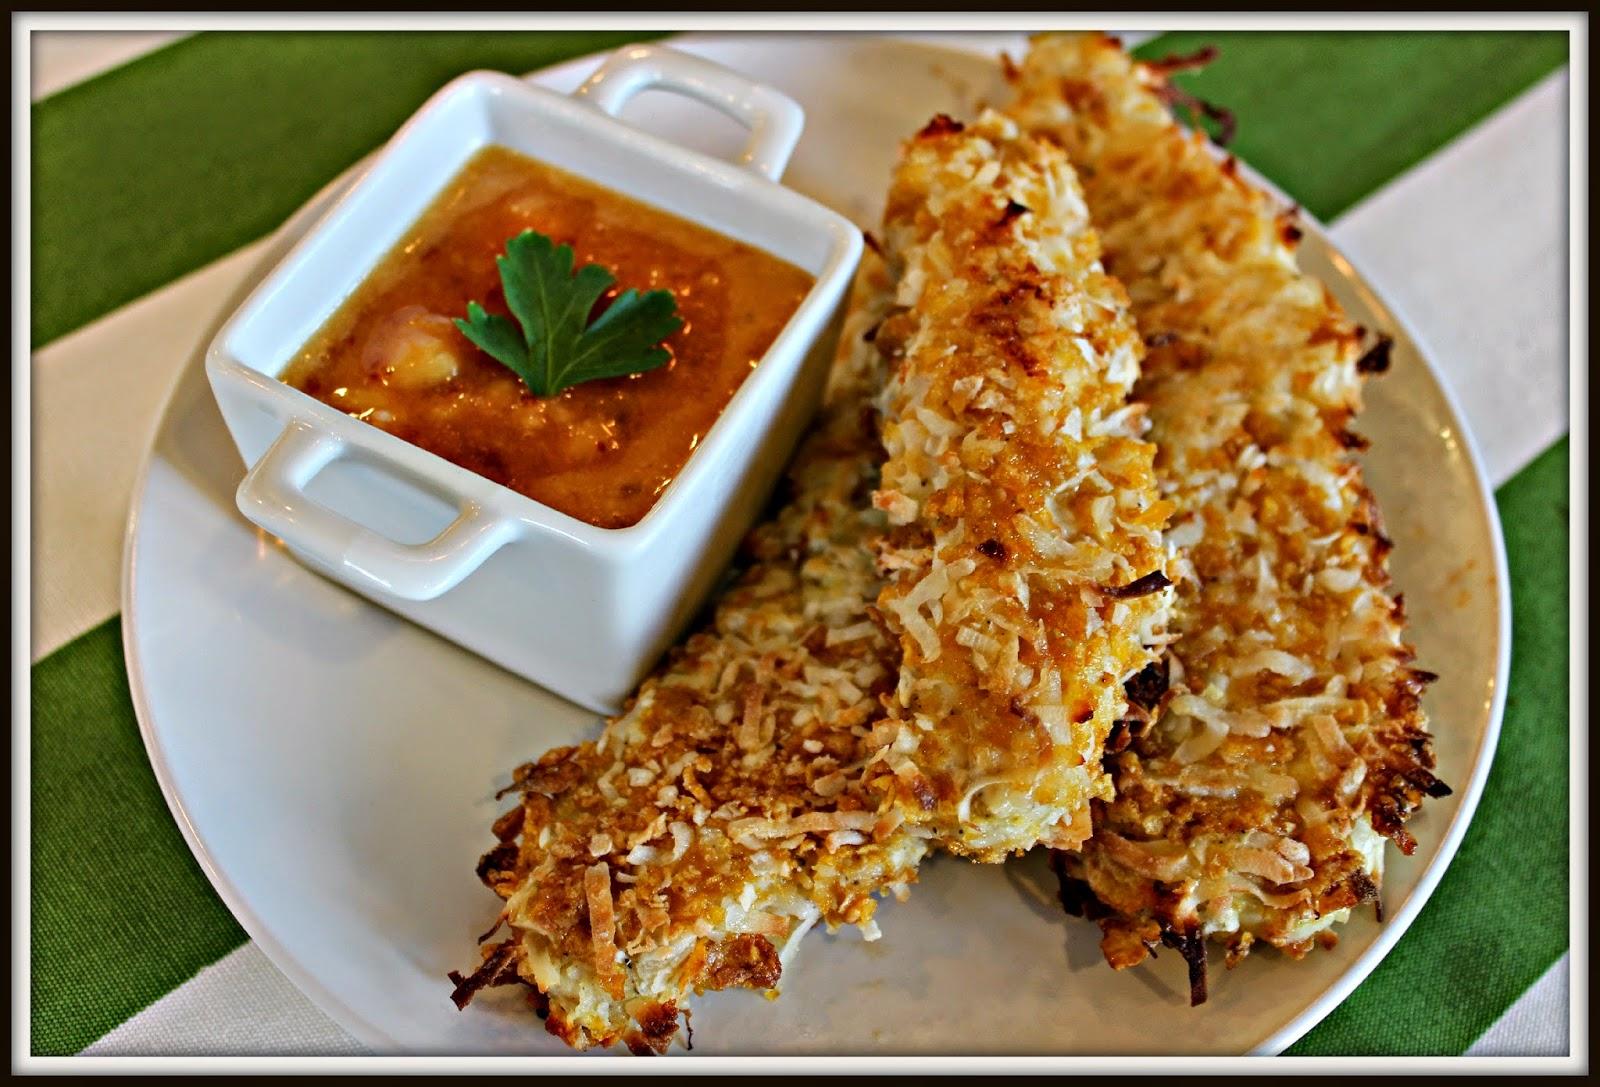 chicken, coconut, corn flakes, kid food, Recipe:  Chicken, Recipe:  Main Dish, Recipe:  Healthy Recipes, baked chicken strips, baked chicken nuggets, coconut chicken